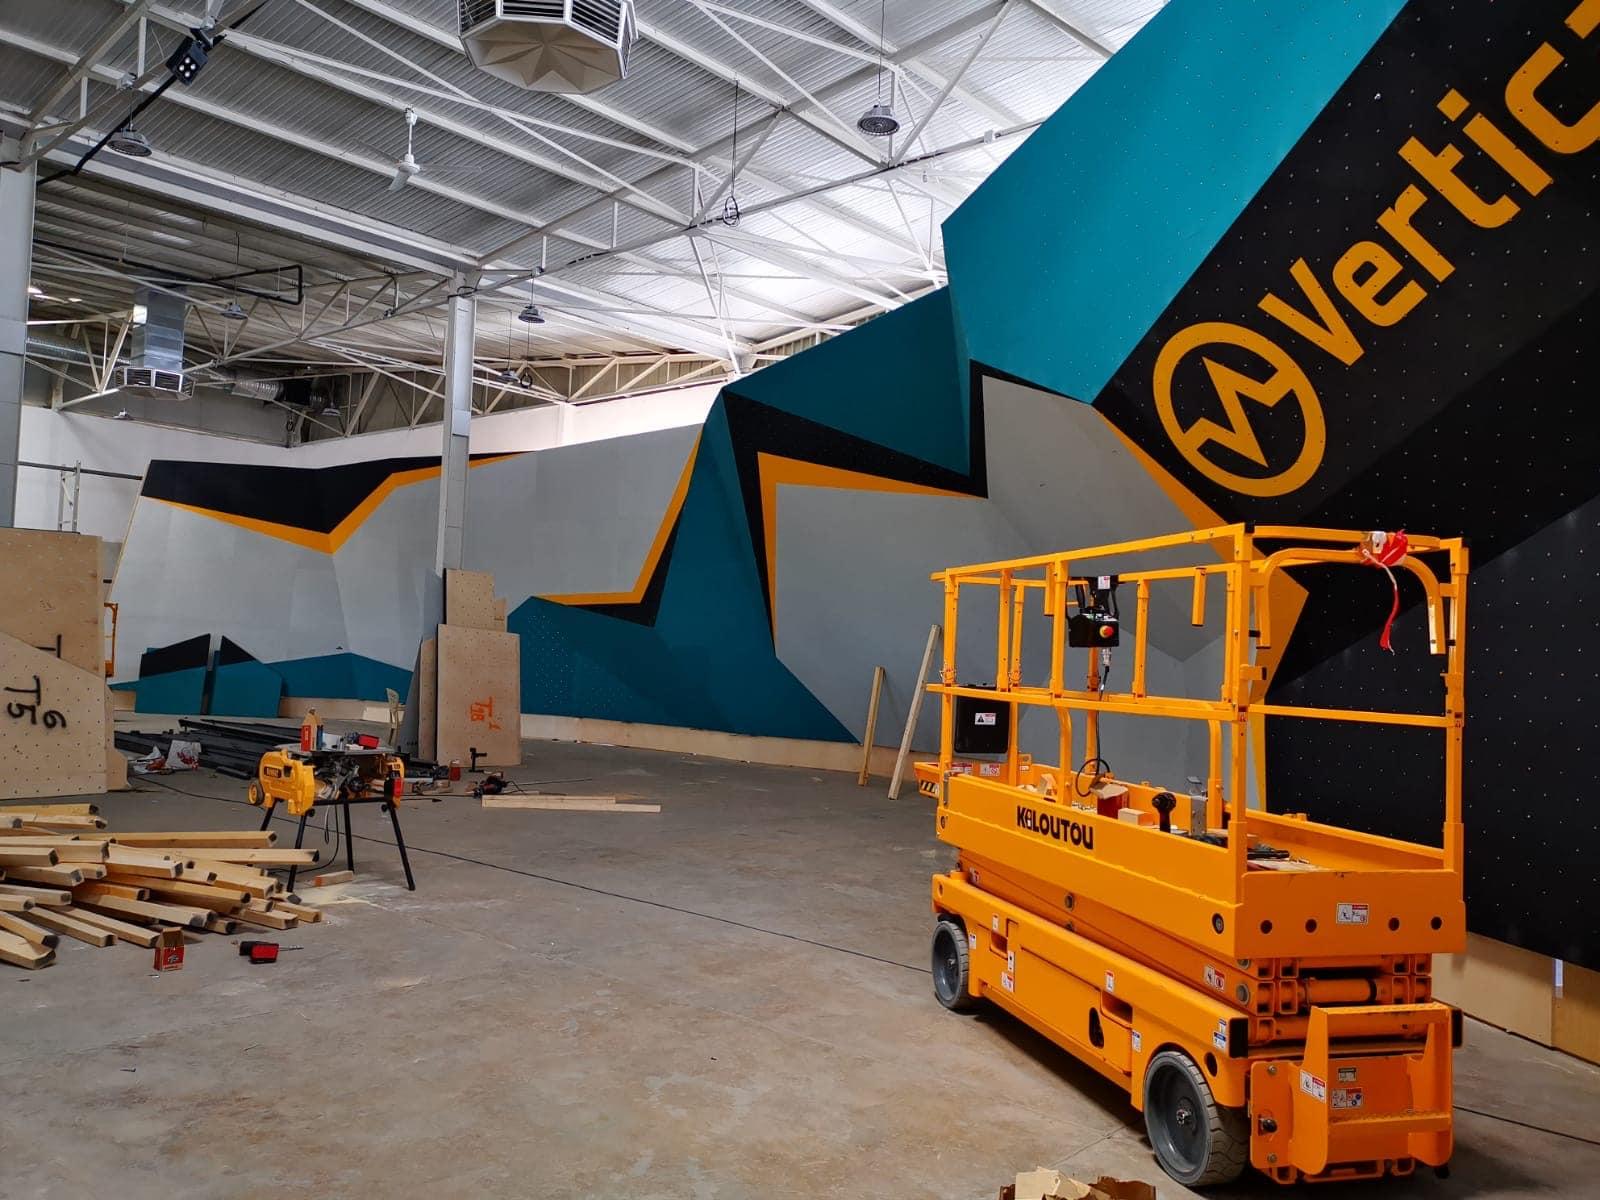 travaux à vertical'art toulon , escalade de bloc en indoor